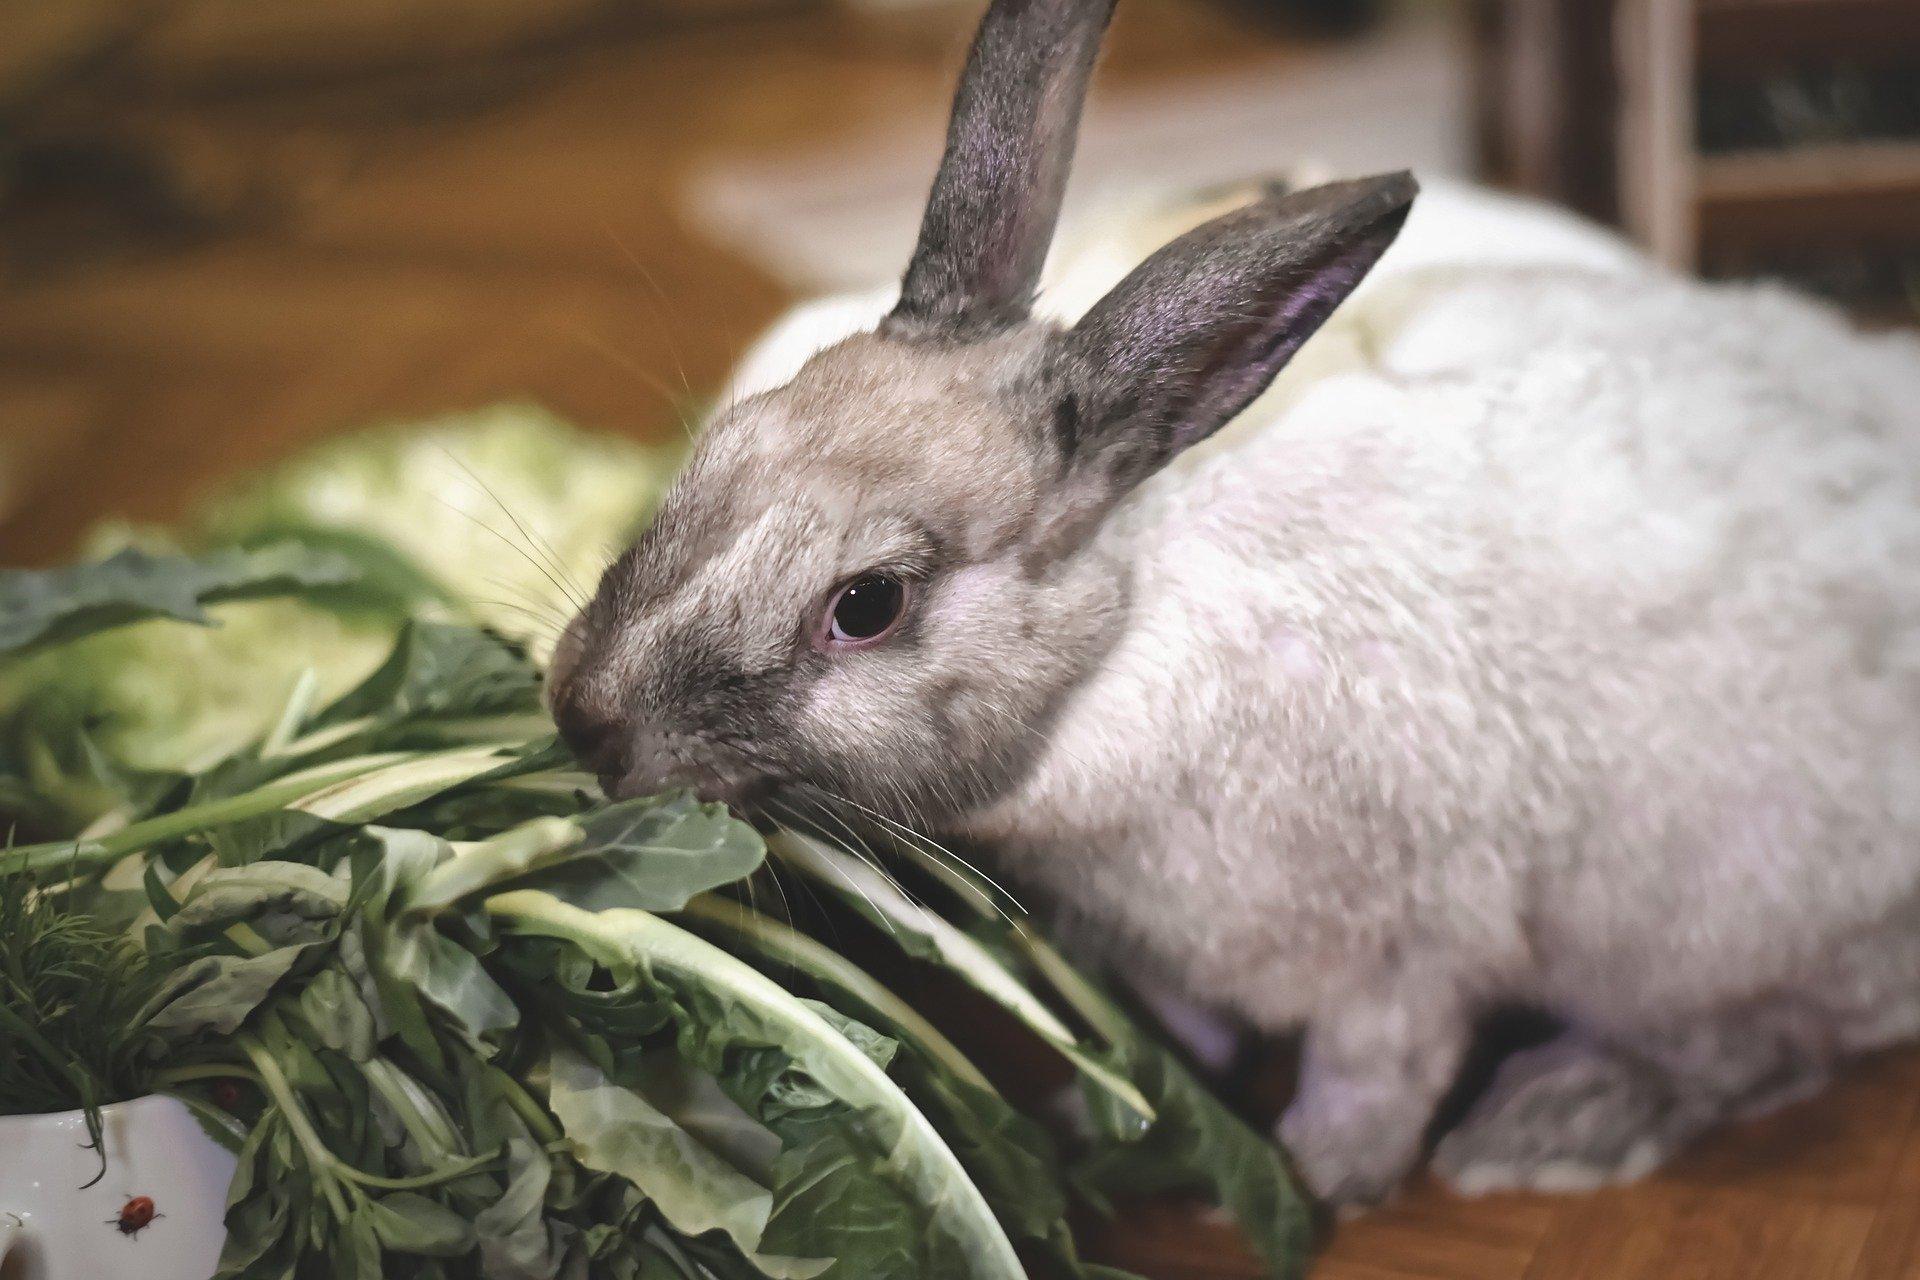 dwarf-rabbit-4925716_1920